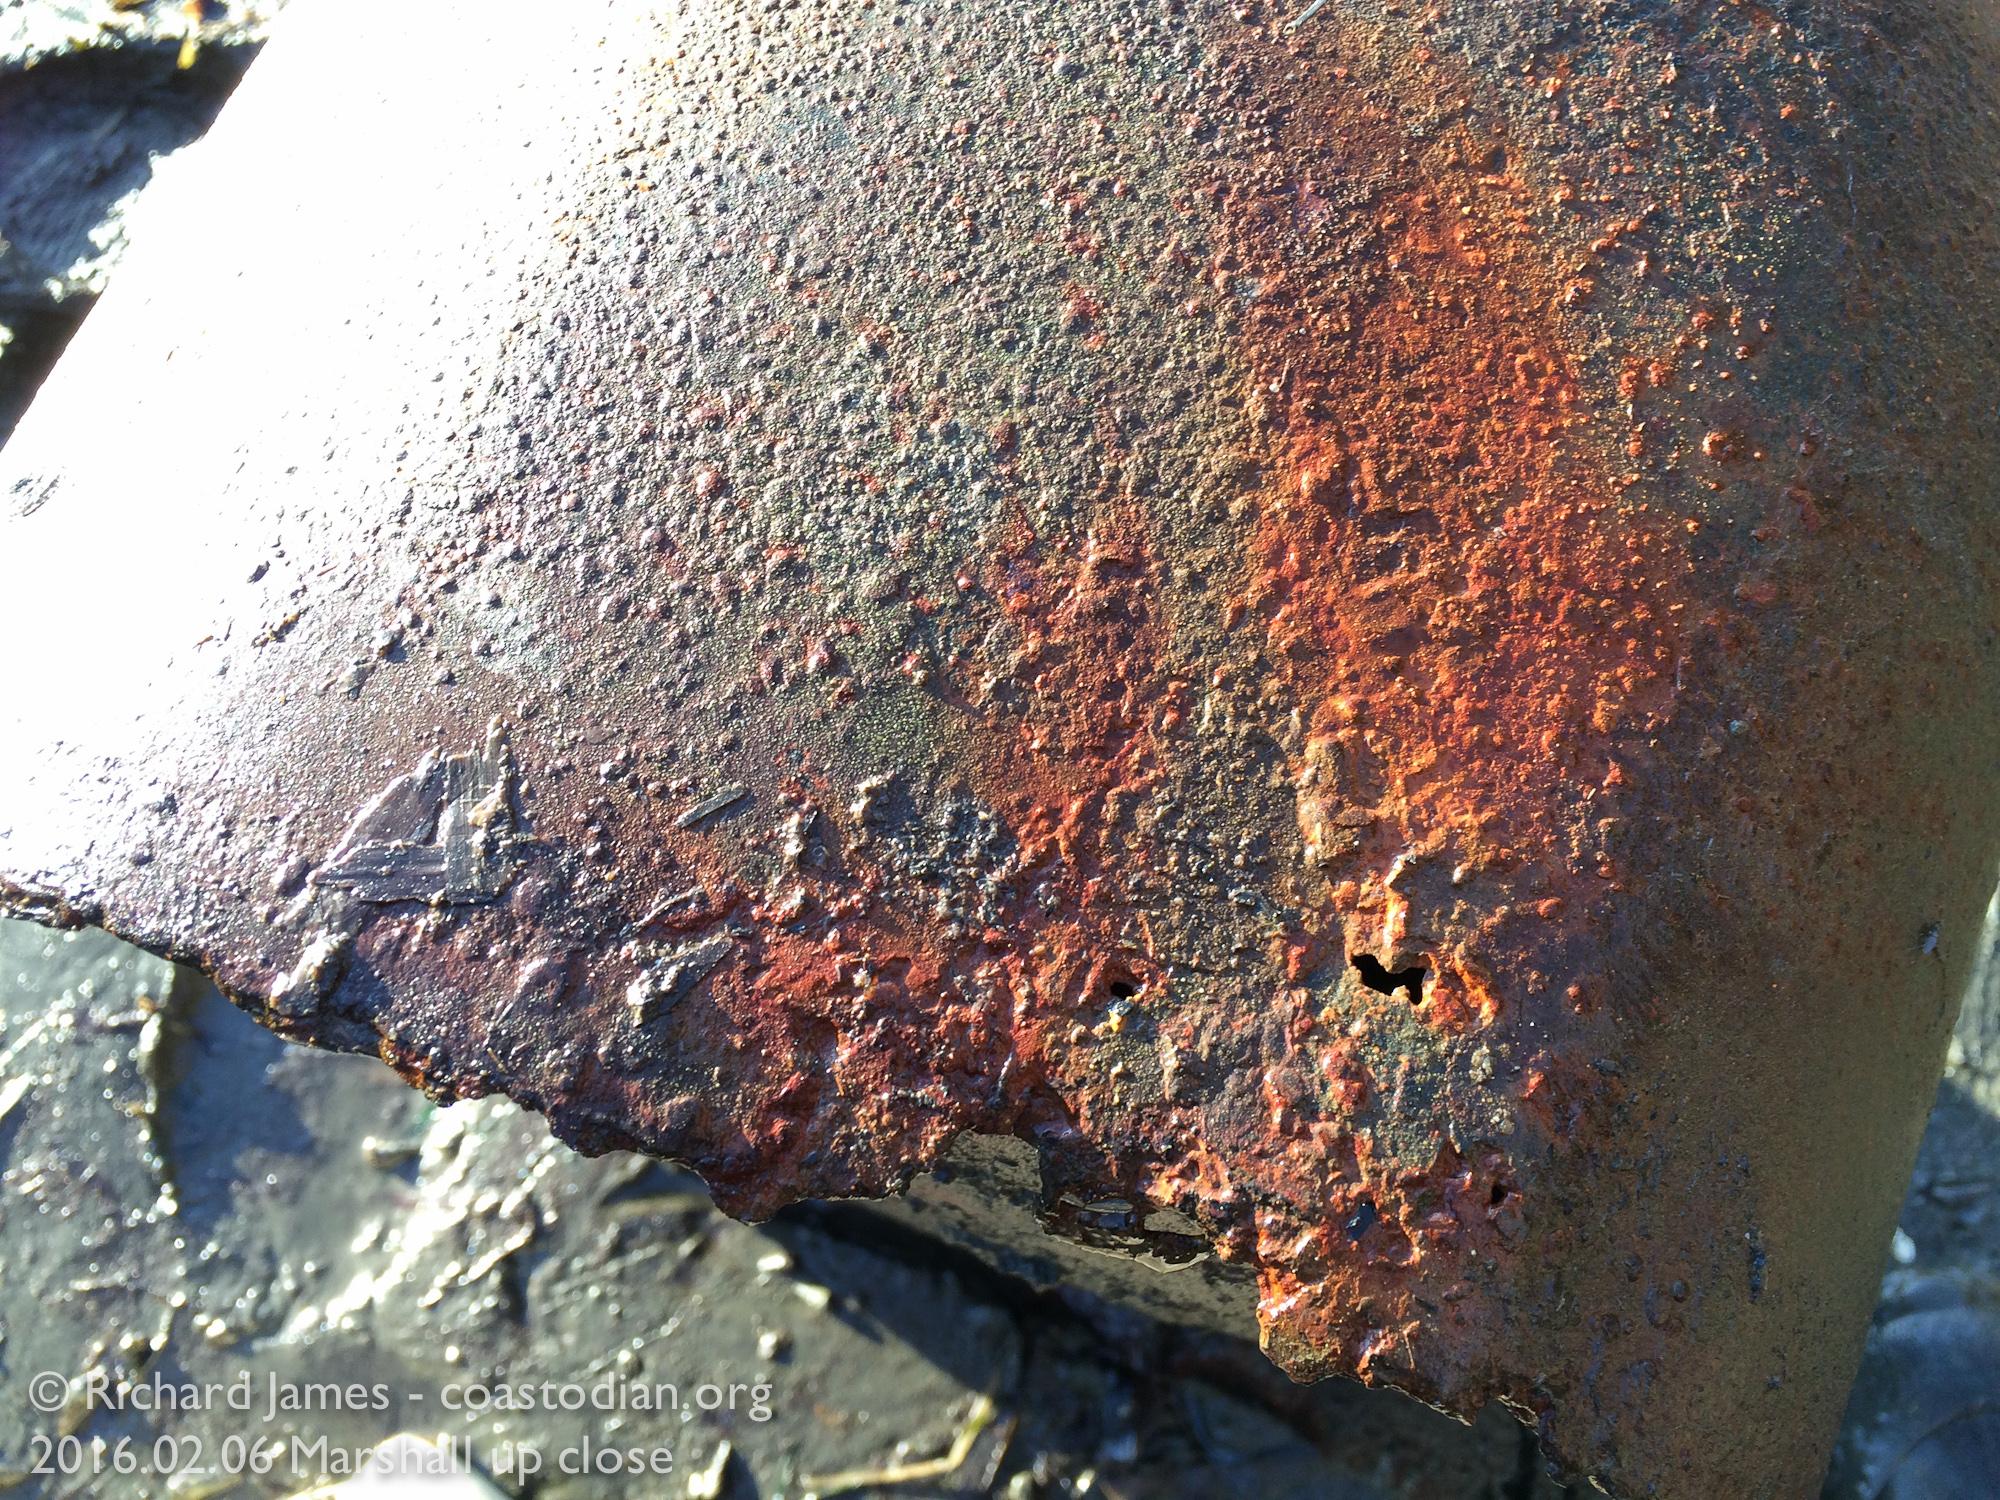 Capsized boat - 5 gallon gas tank, rusting in Tomales Bay ©Richard James - coastodian.org